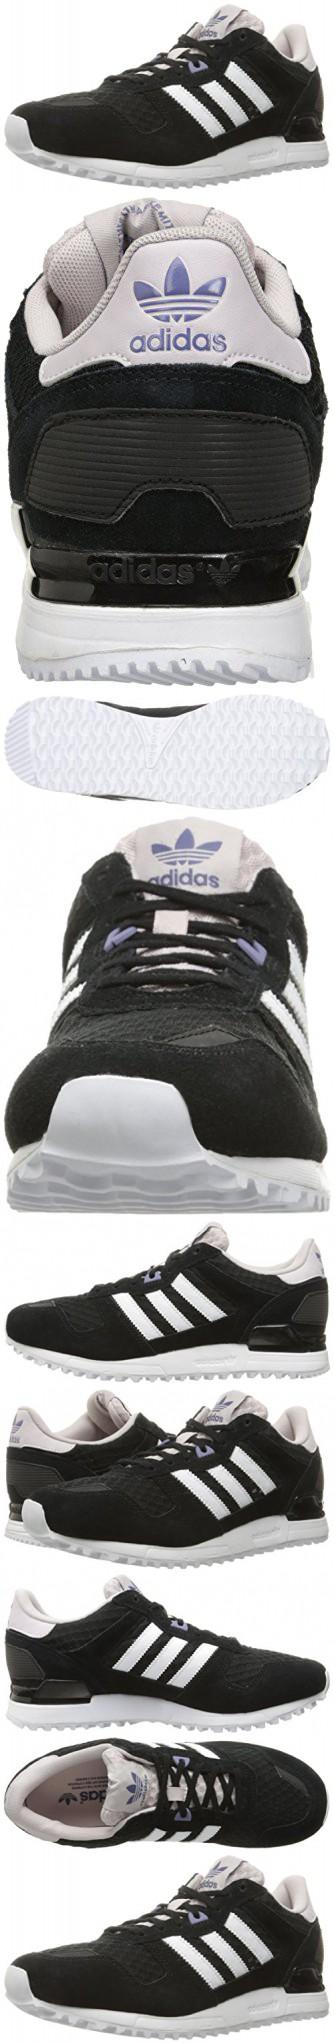 adidas performance base springblade drive 2 calé des chaussures de course